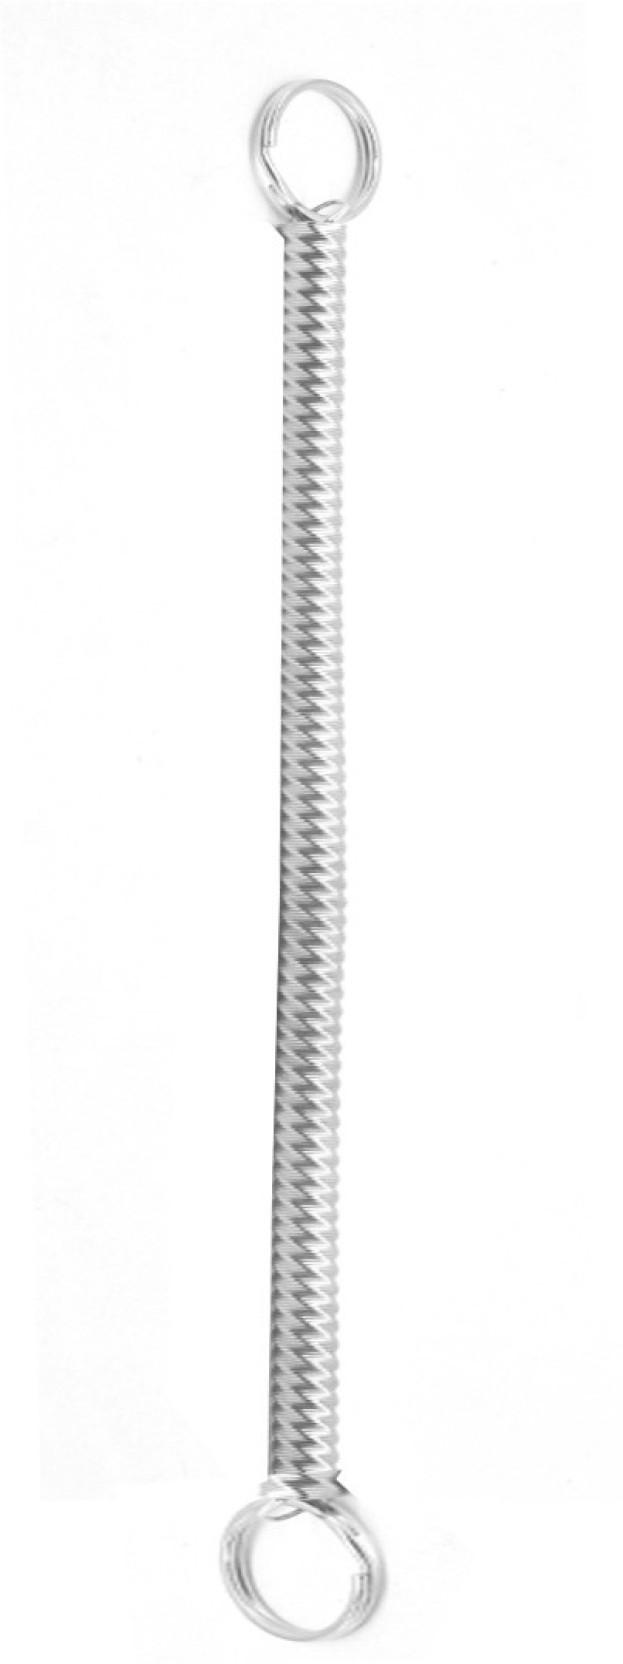 Faynci Spiral Silver Metal Long Key Chain Stretchable String Metal ... d2c675ec6cfa